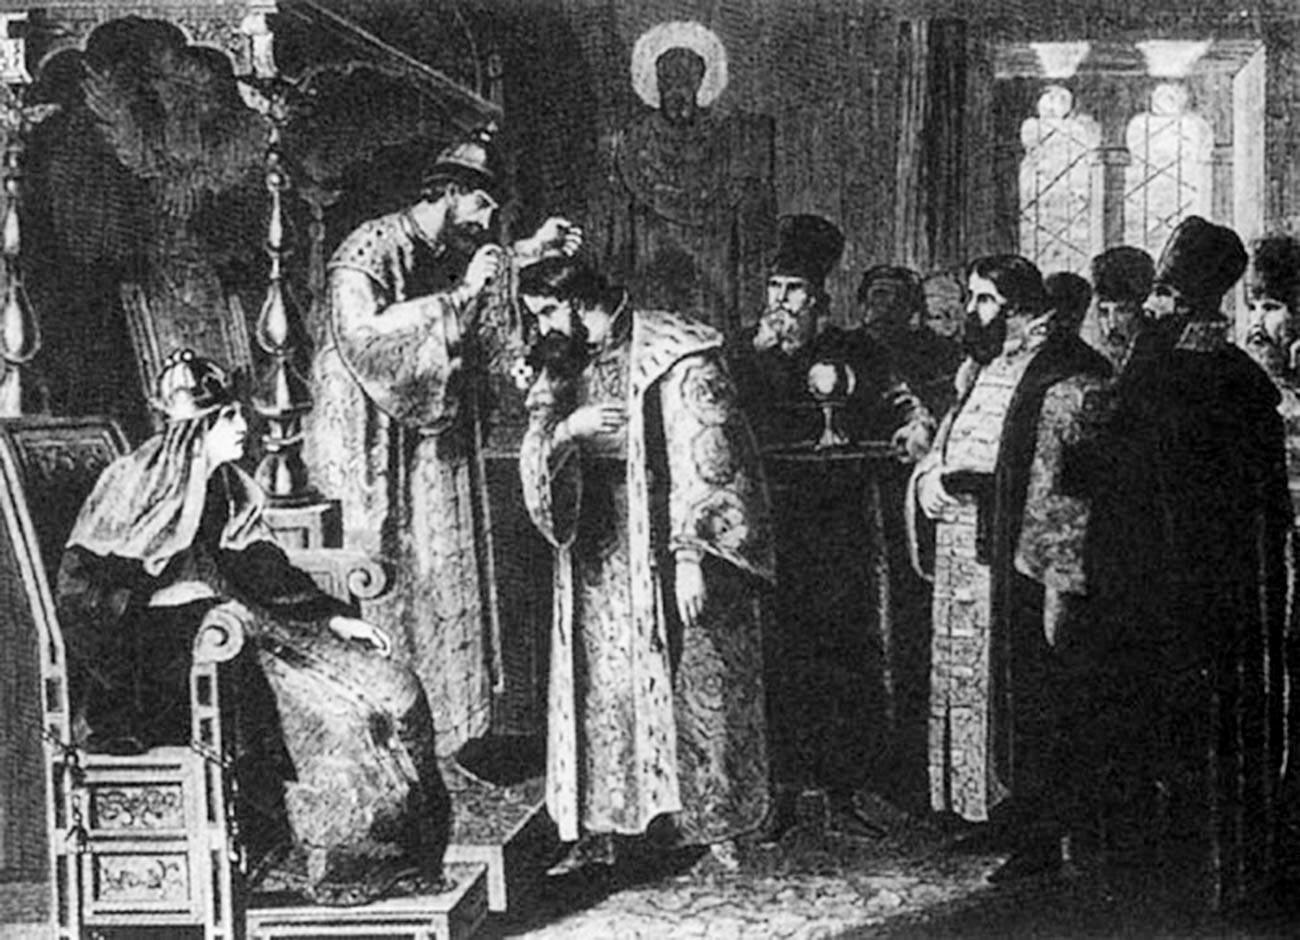 Цар Фьодор Иванович слага златна верижка на Борис Годунов